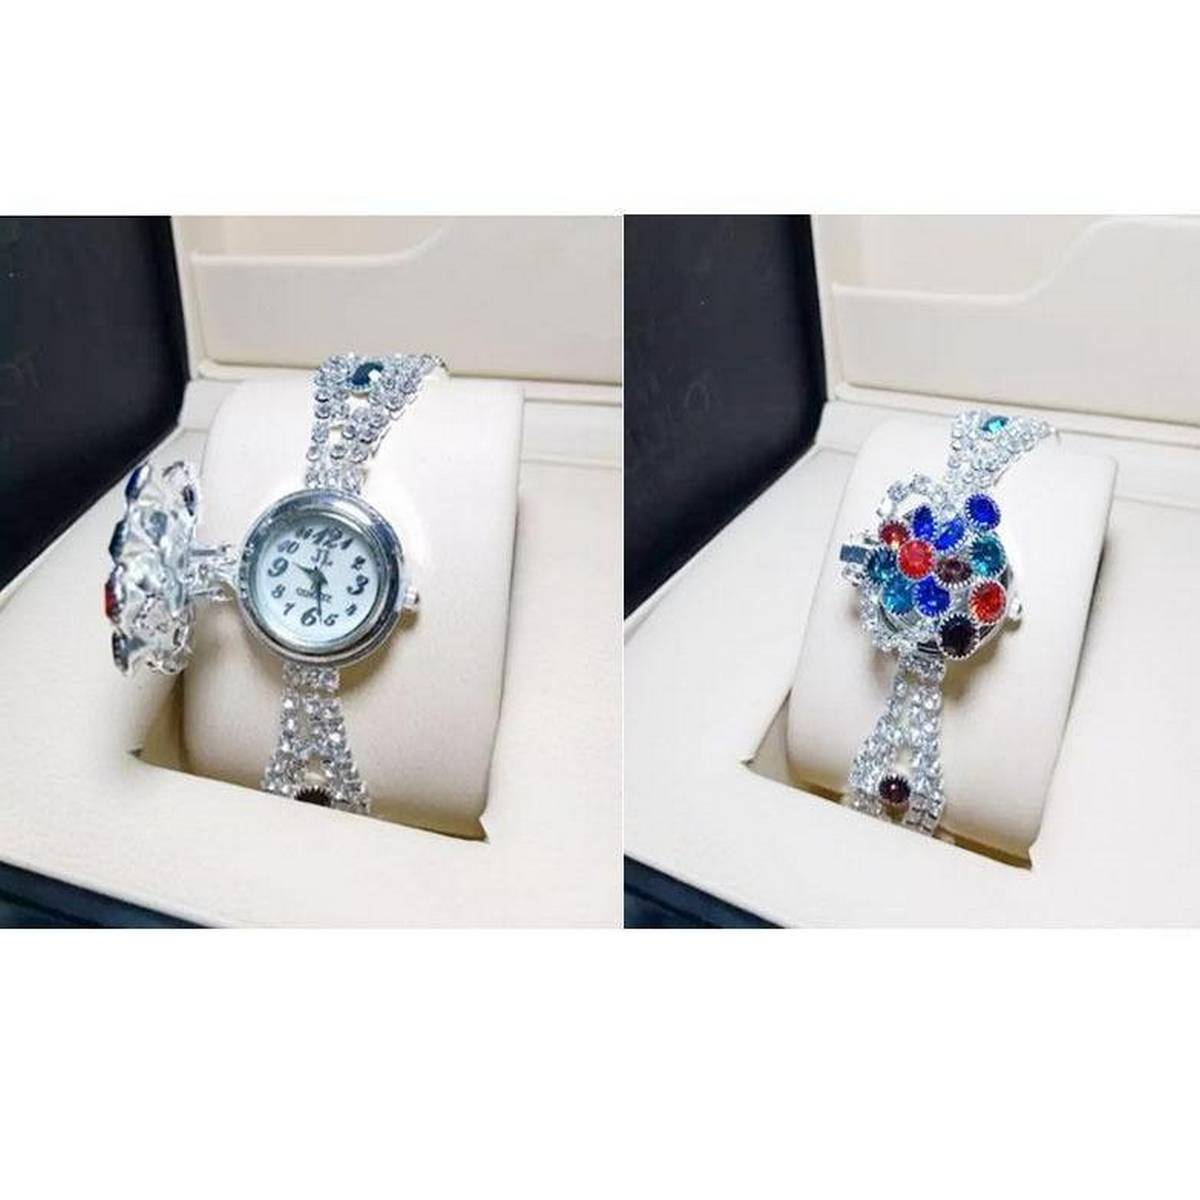 Stylish Silver Diamond Watch For Women